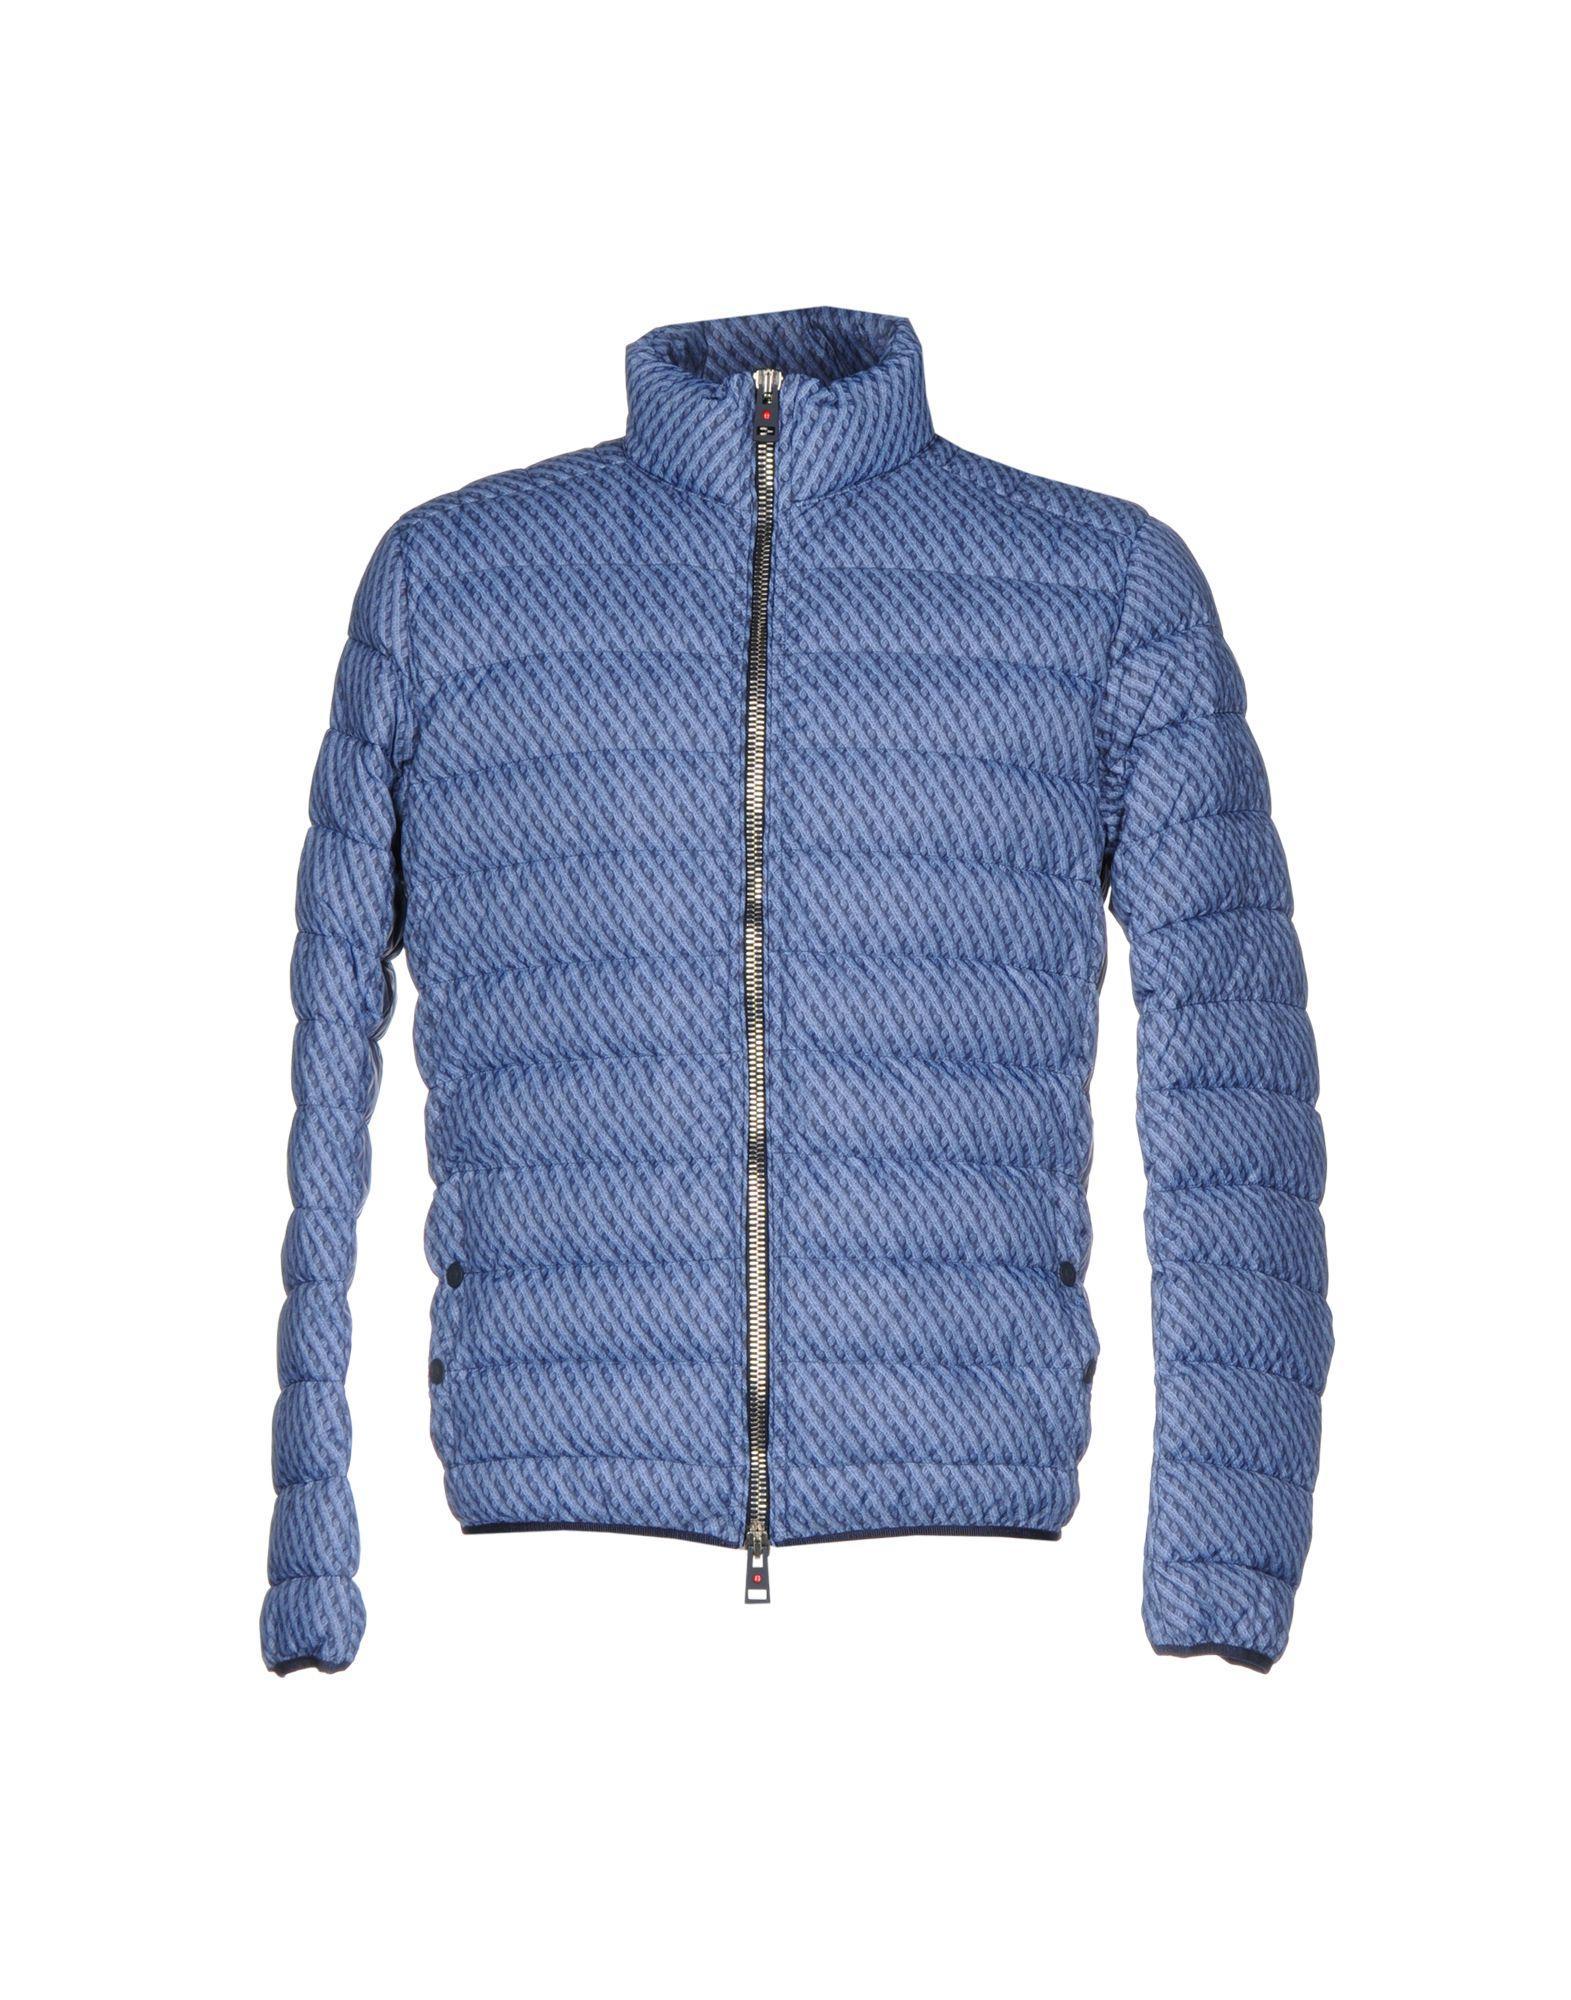 Kired Down Jacket In Pastel Blue